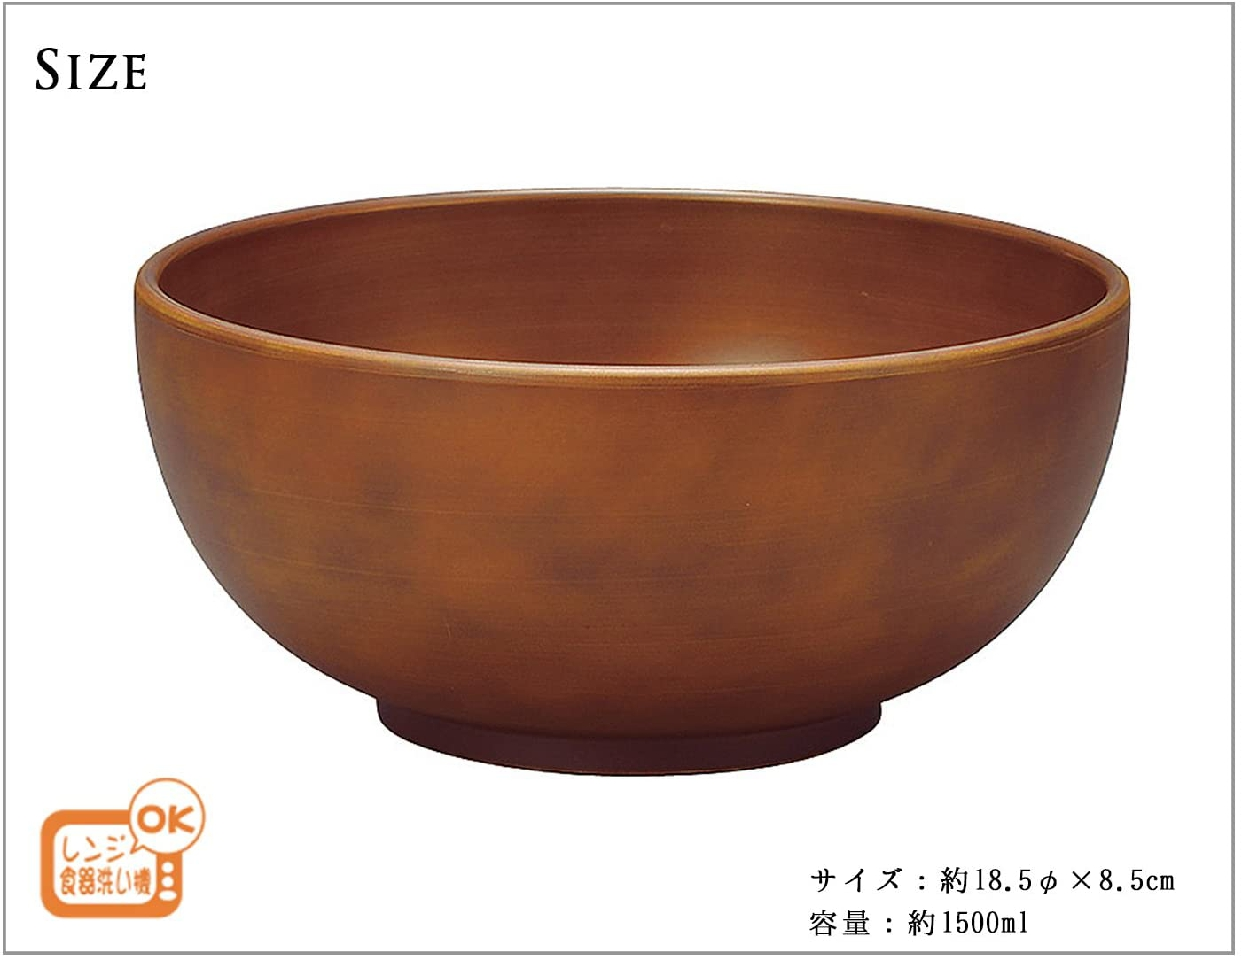 SEE(シー) 麺どんぶり 1500ml ライトブラウンの商品画像3